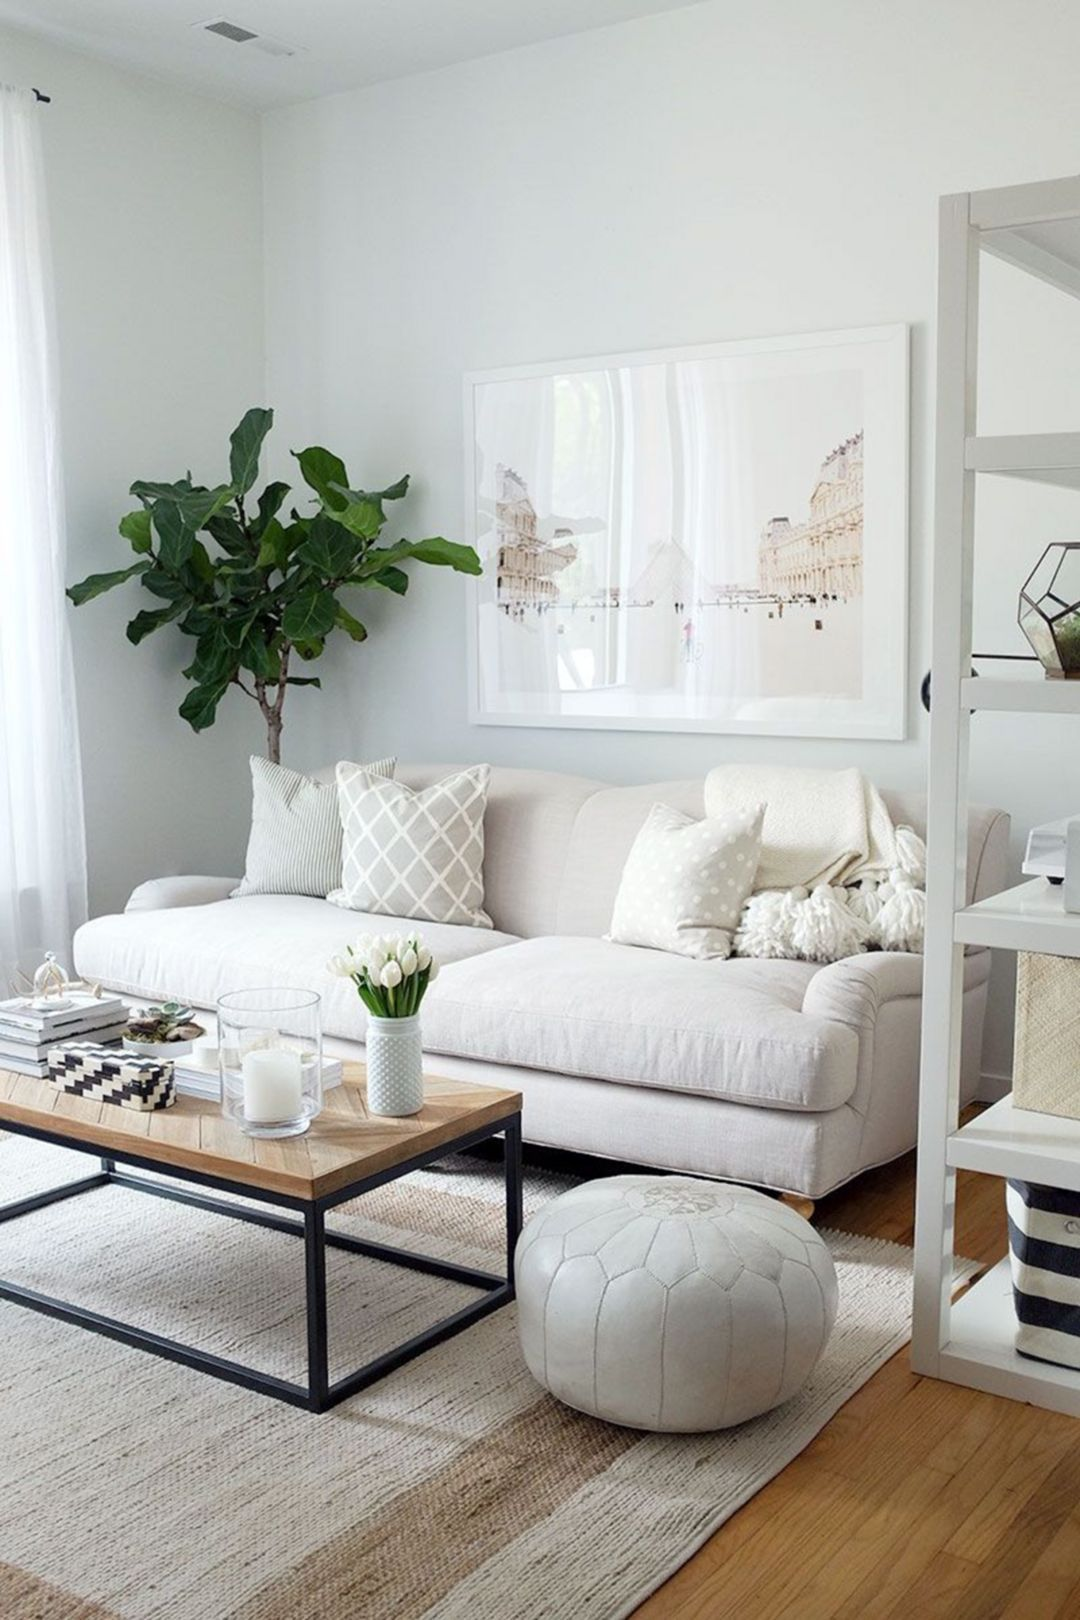 15 Best Decor Ideas For Your Small Living Room Apartment Decor Gardening Ideas Small Living Room Decor Scandinavian Design Living Room Living Room Scandinavian